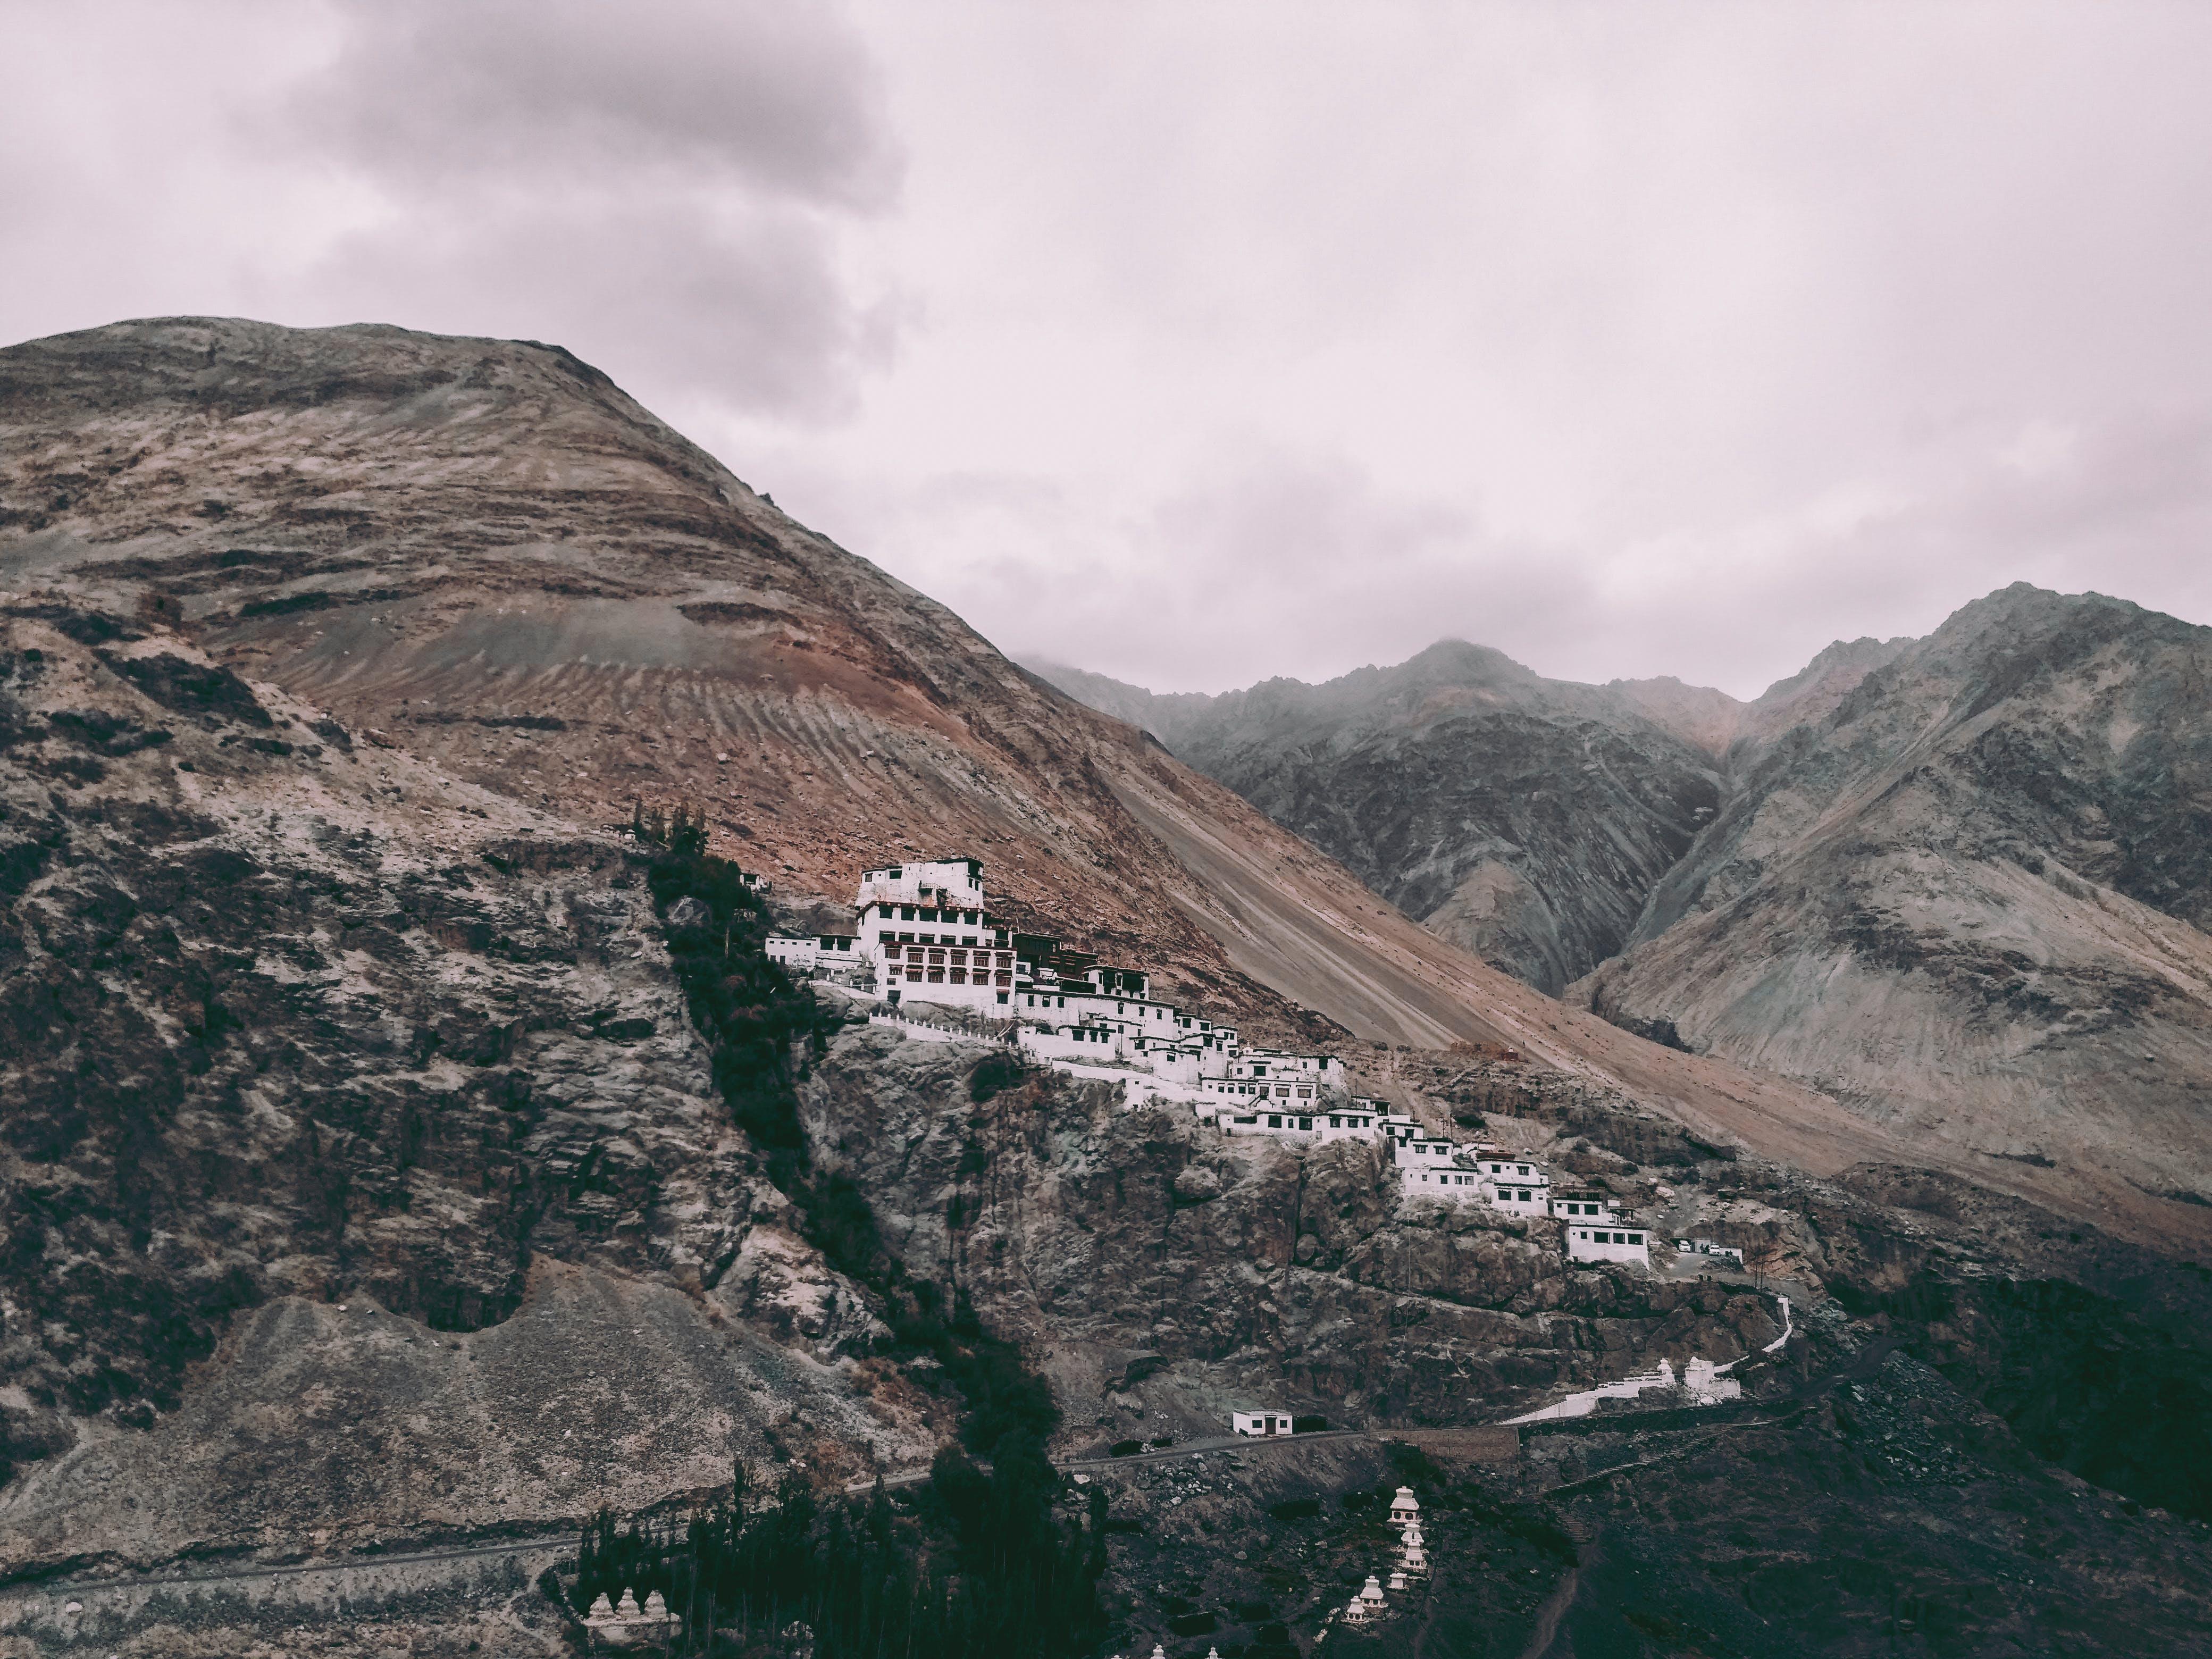 White Concrete Buildings on Rock Mountain Under Gray Sky